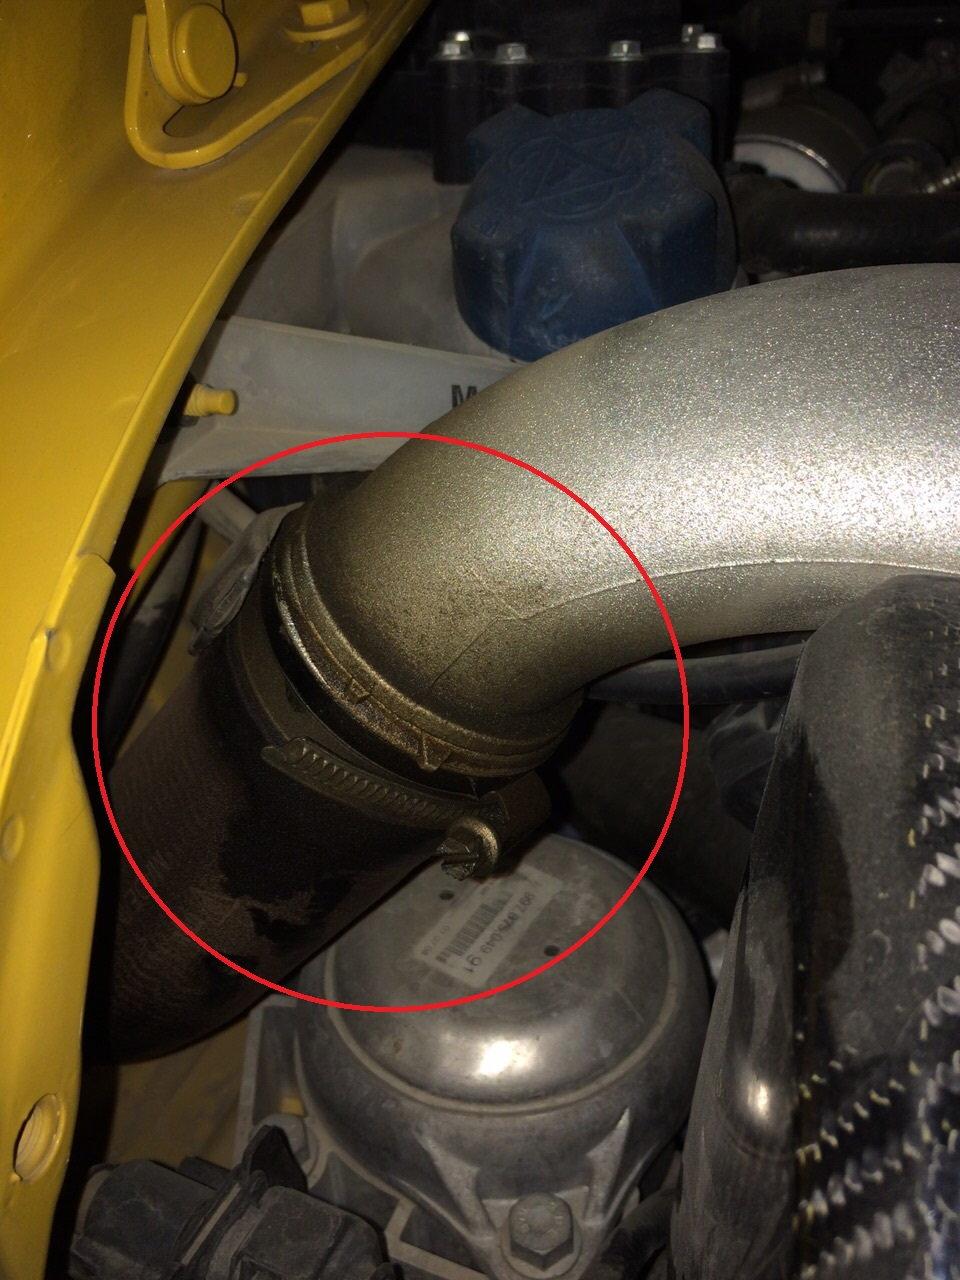 Strange sound from my GT2 turbos and oil leak - 6SpeedOnline